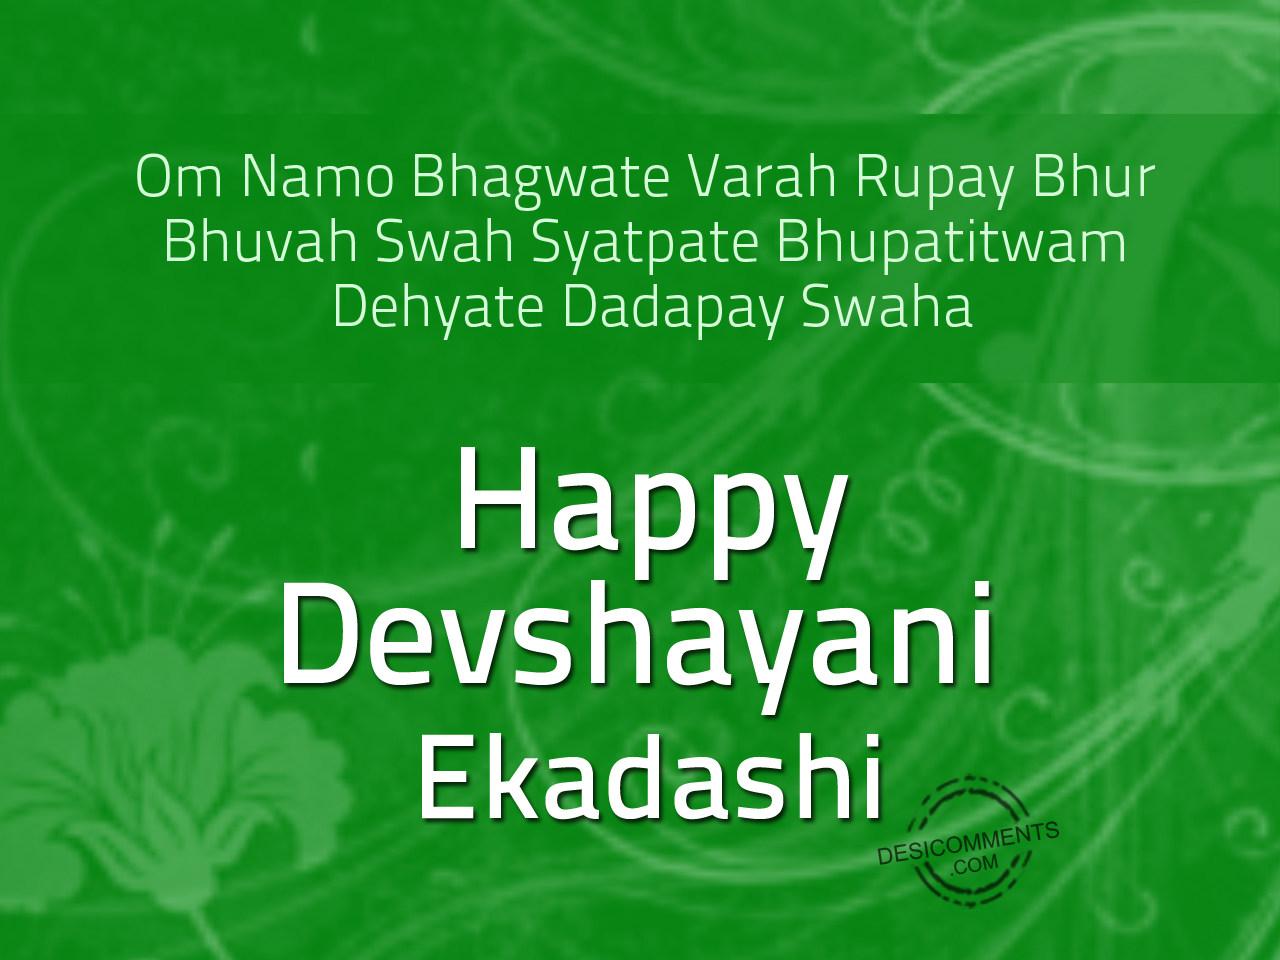 Happy devshayani ekadashi 2015 wishes images wallpapers quotes sms also visit happy guru purnima 2015 animated gif images kristyandbryce Images